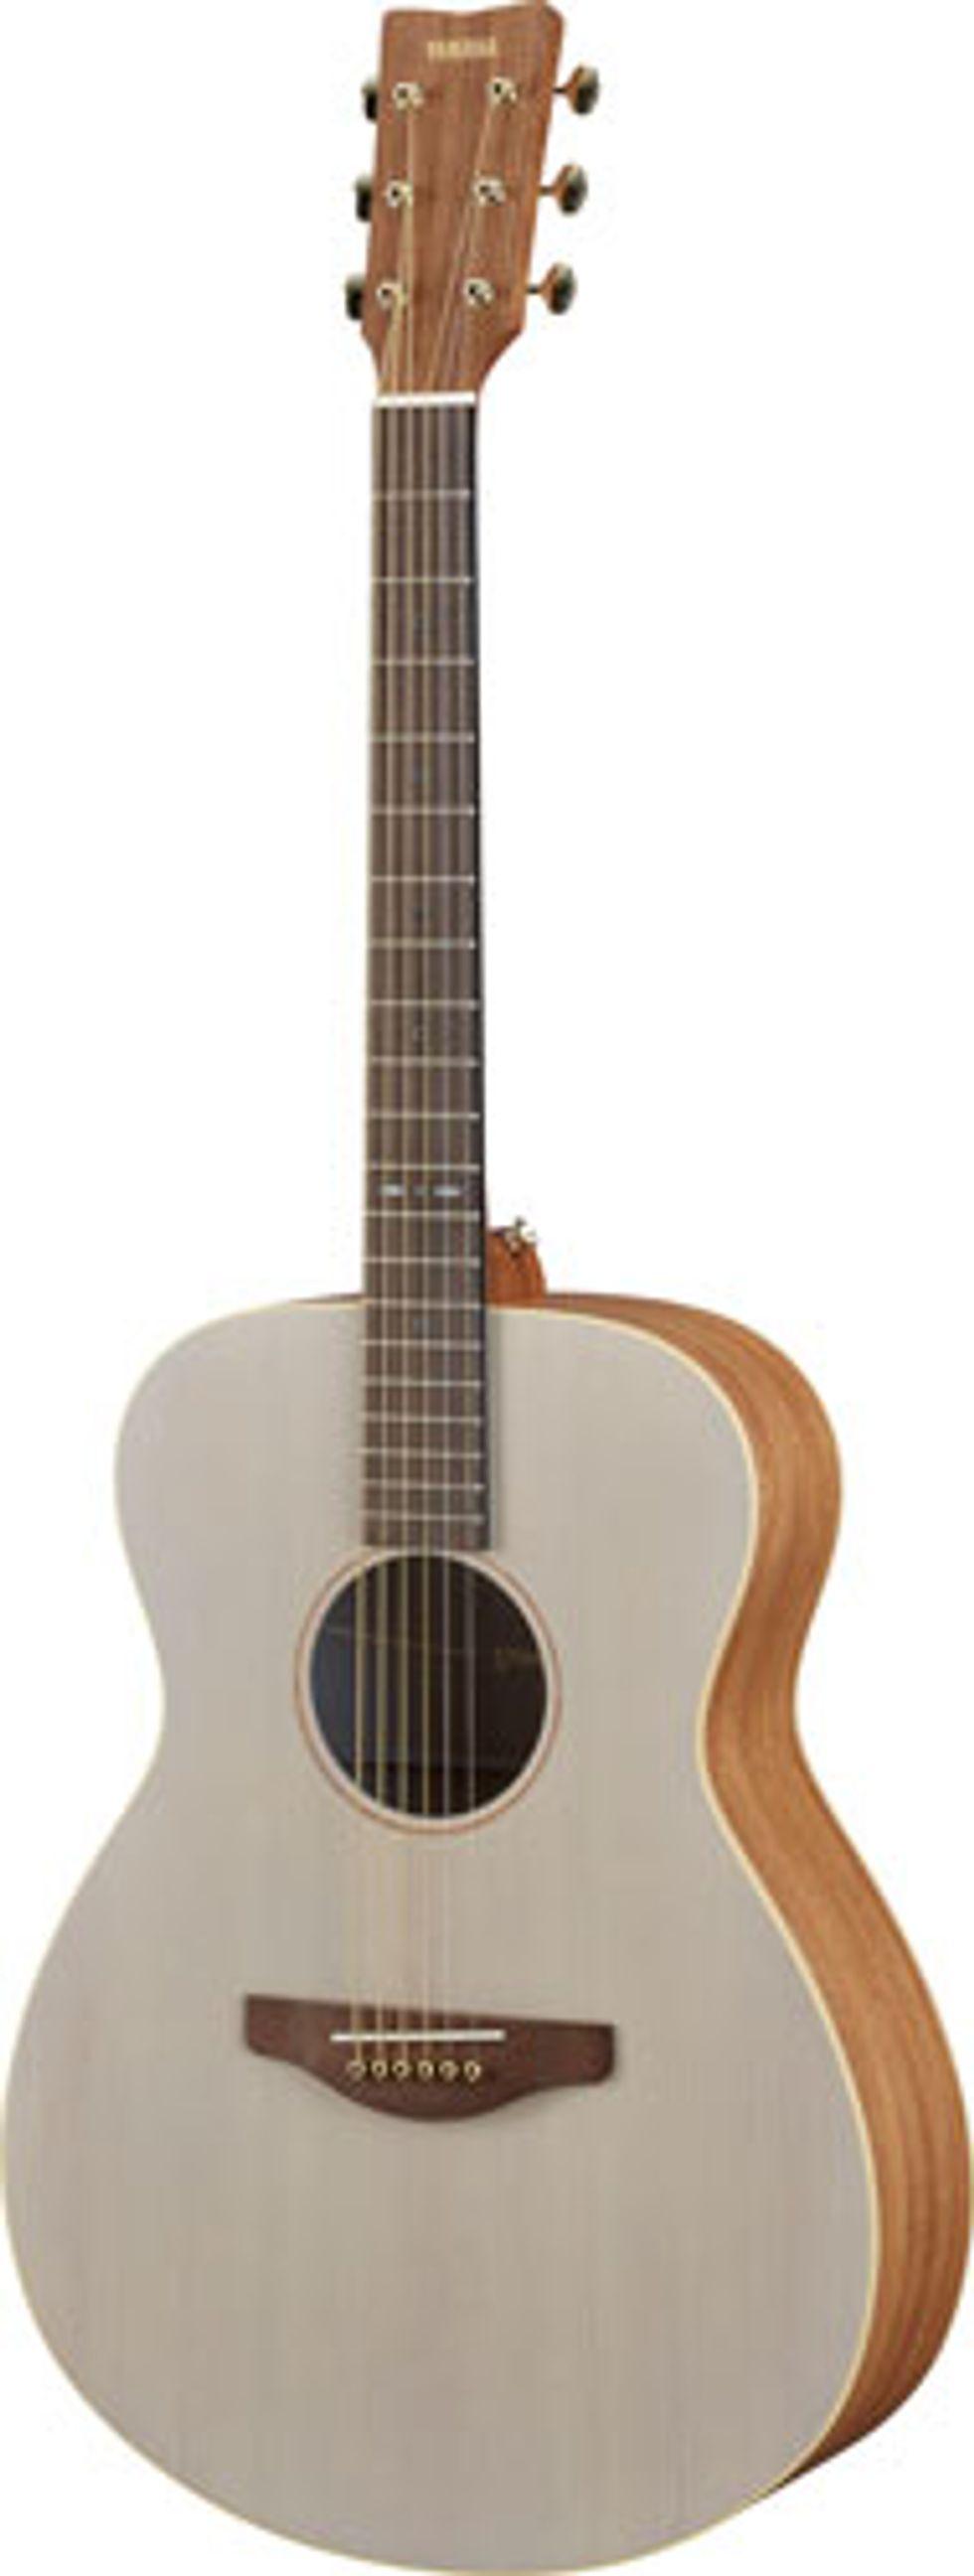 yamaha releases storia line of acoustic guitars premier guitar. Black Bedroom Furniture Sets. Home Design Ideas